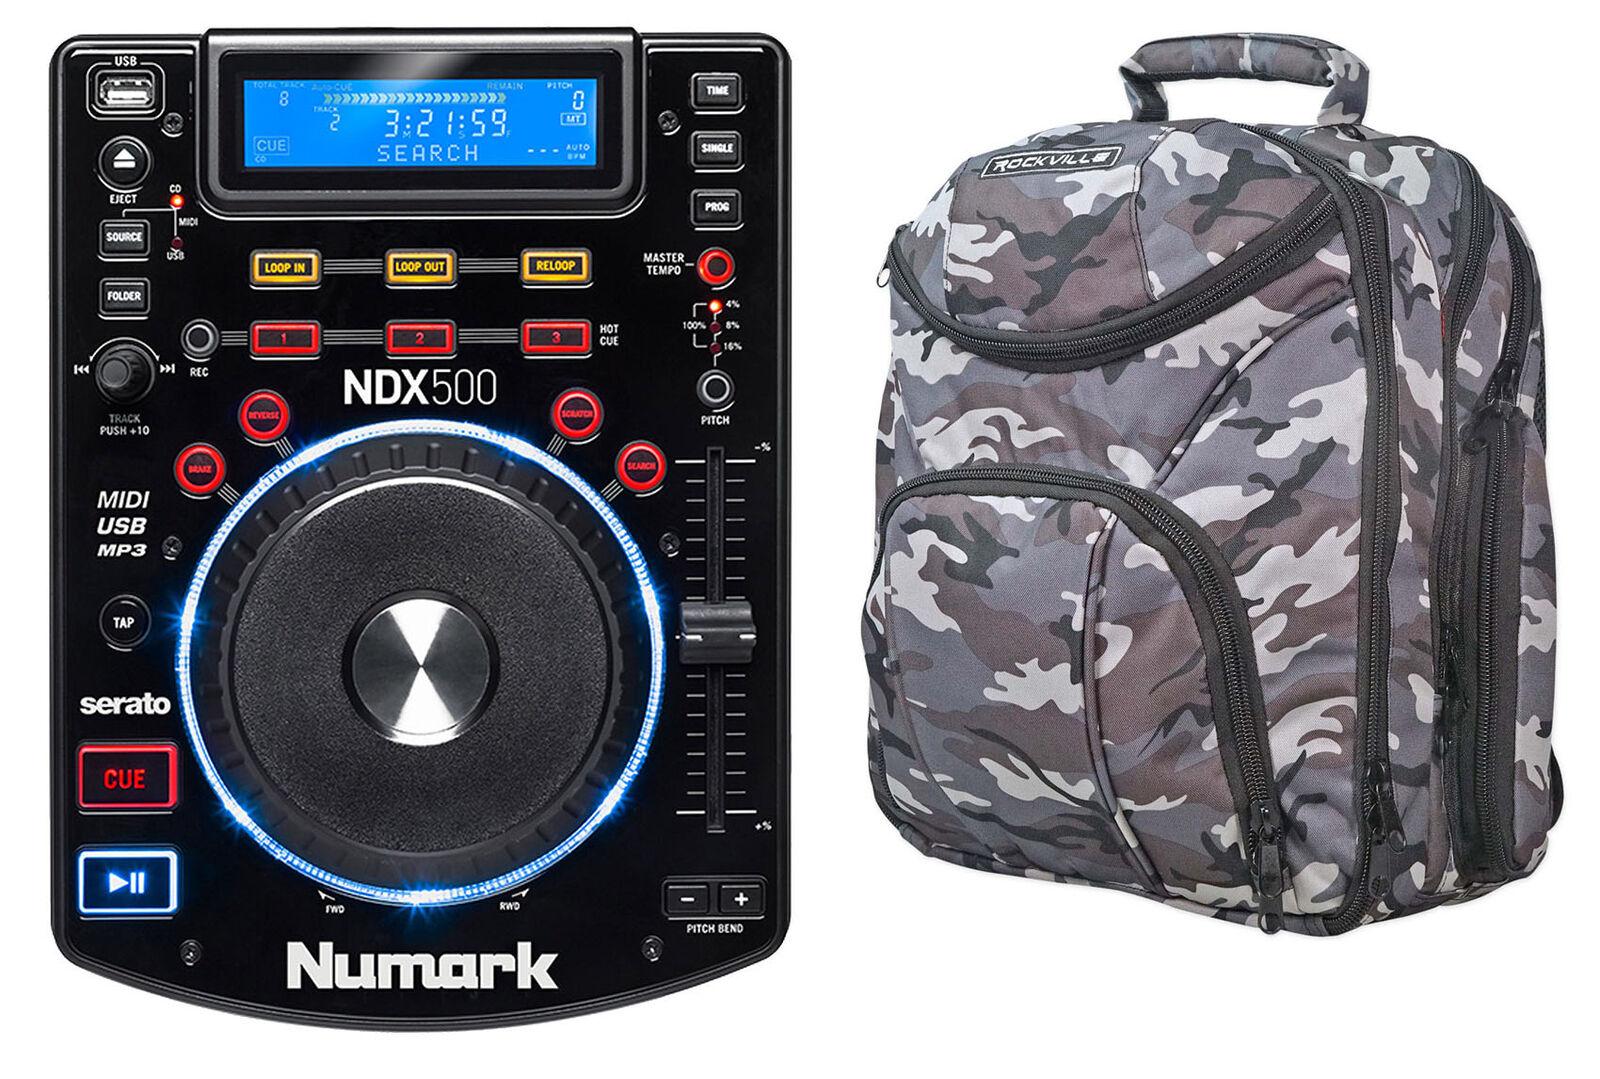 Numark NDX500 DJ Tabletop USB CD Media Player Software Controller+Gear CAMOPACK